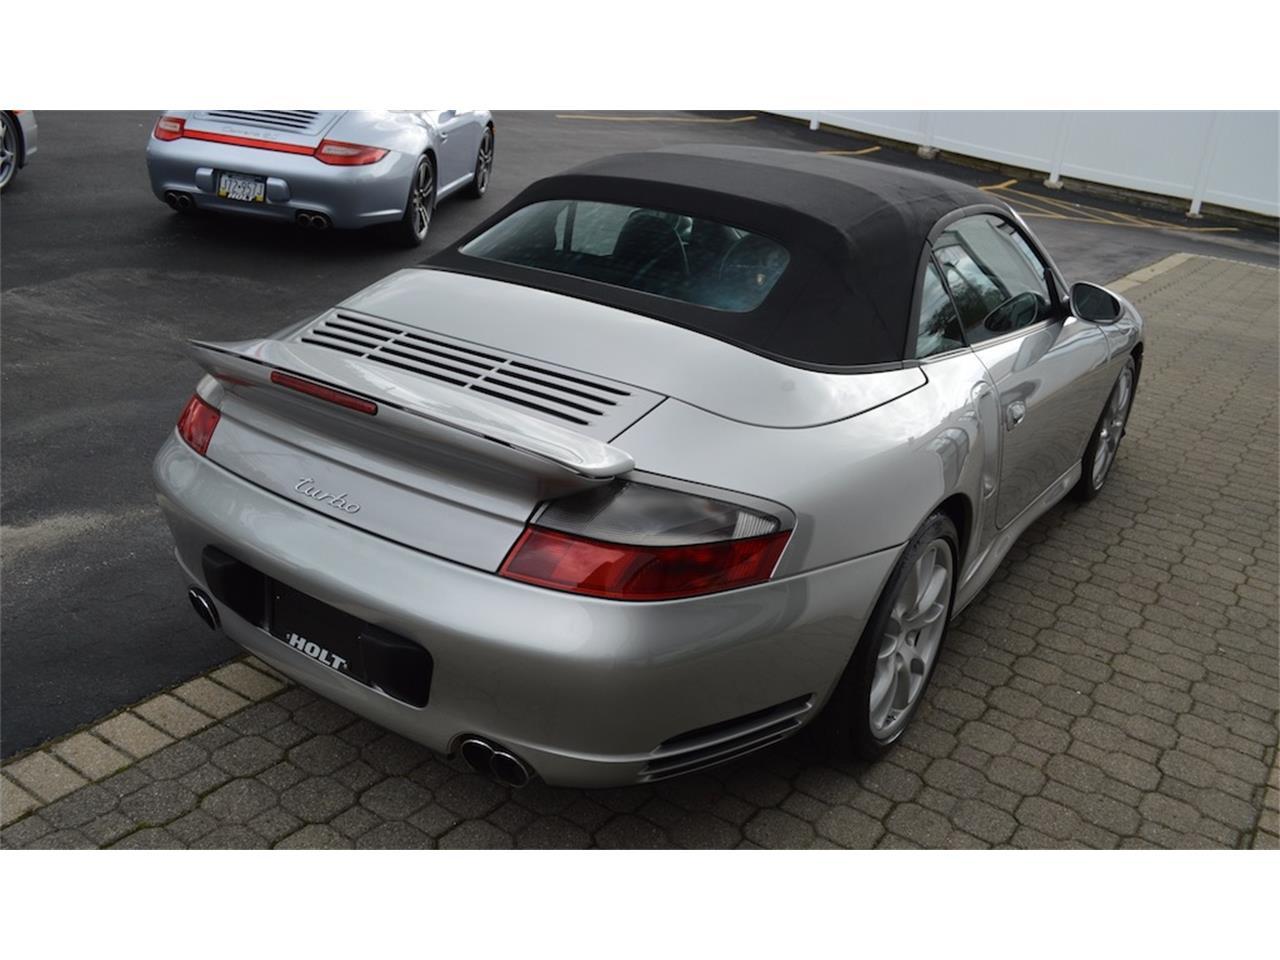 Large Picture of 2004 Porsche 996 Turbo Cabriolet - $46,500.00 - NQV0